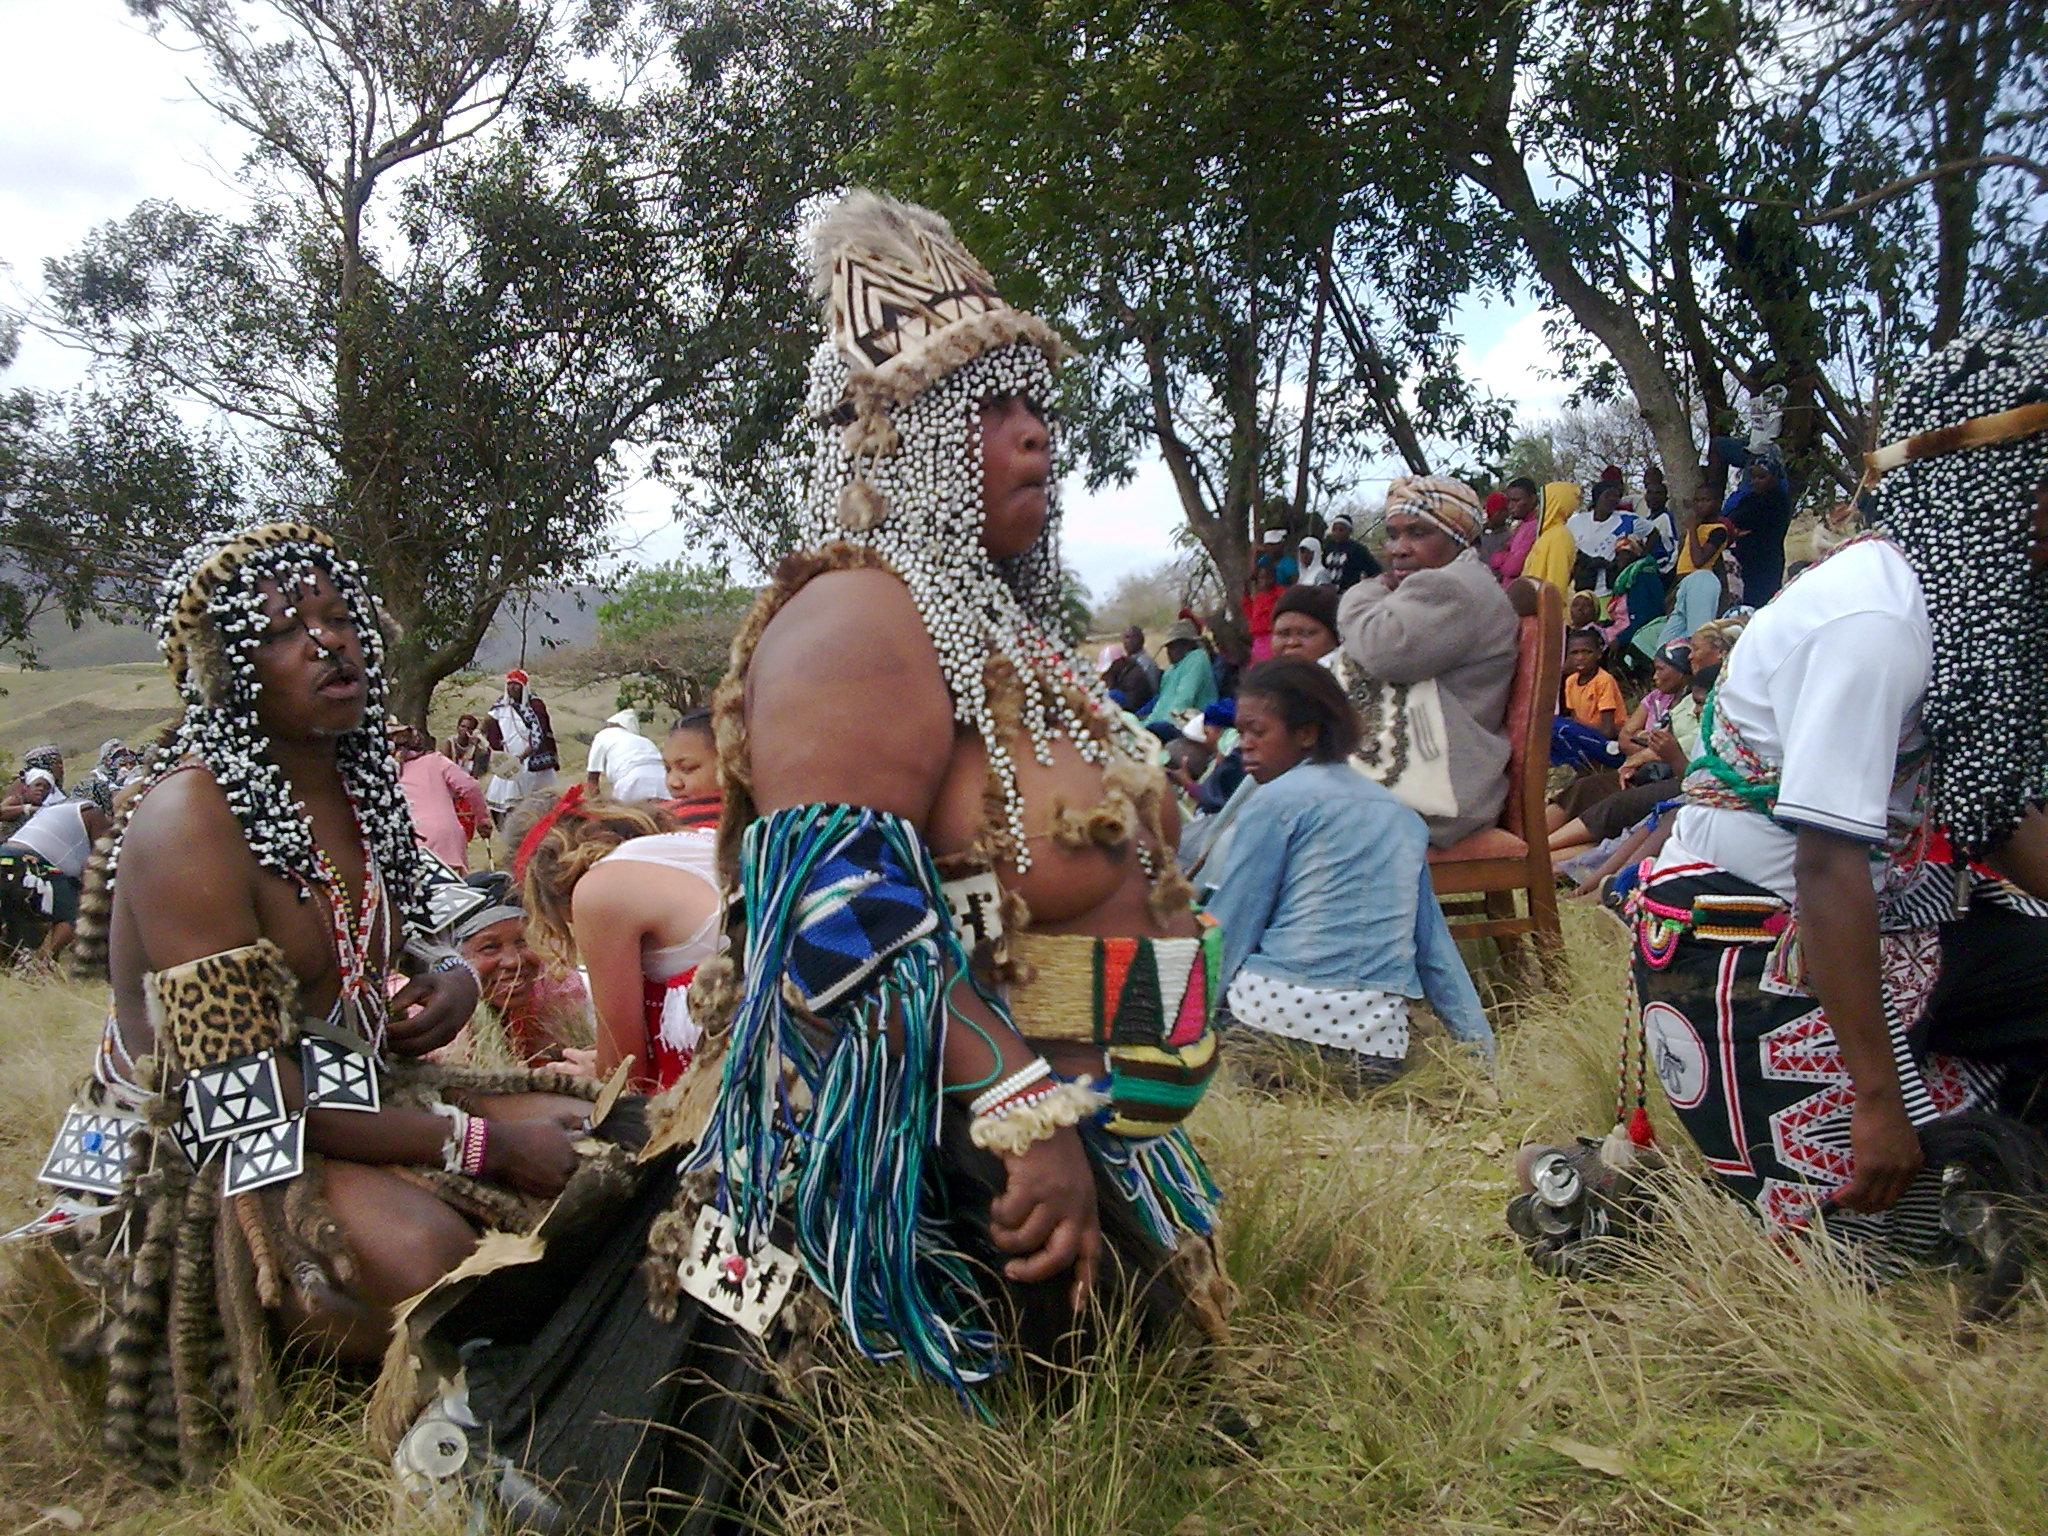 Annual Sangoma ceremony in Zululand /static/Zulu/Image014.jpg